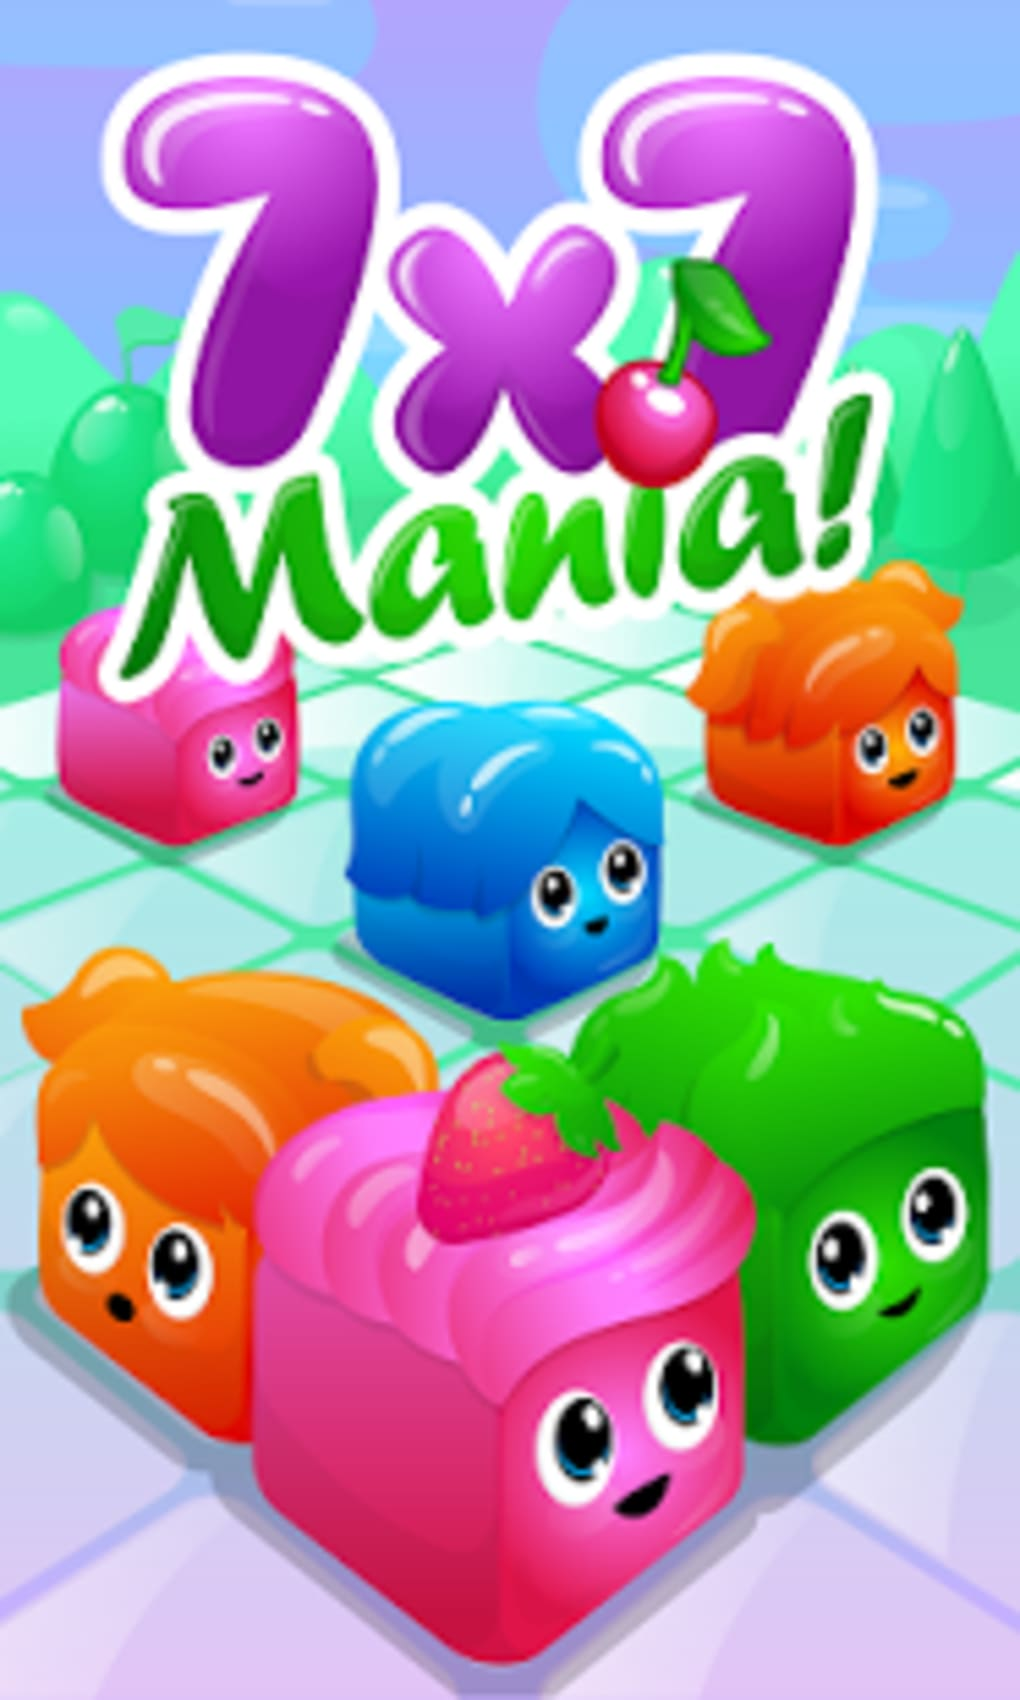 7x7 Mania